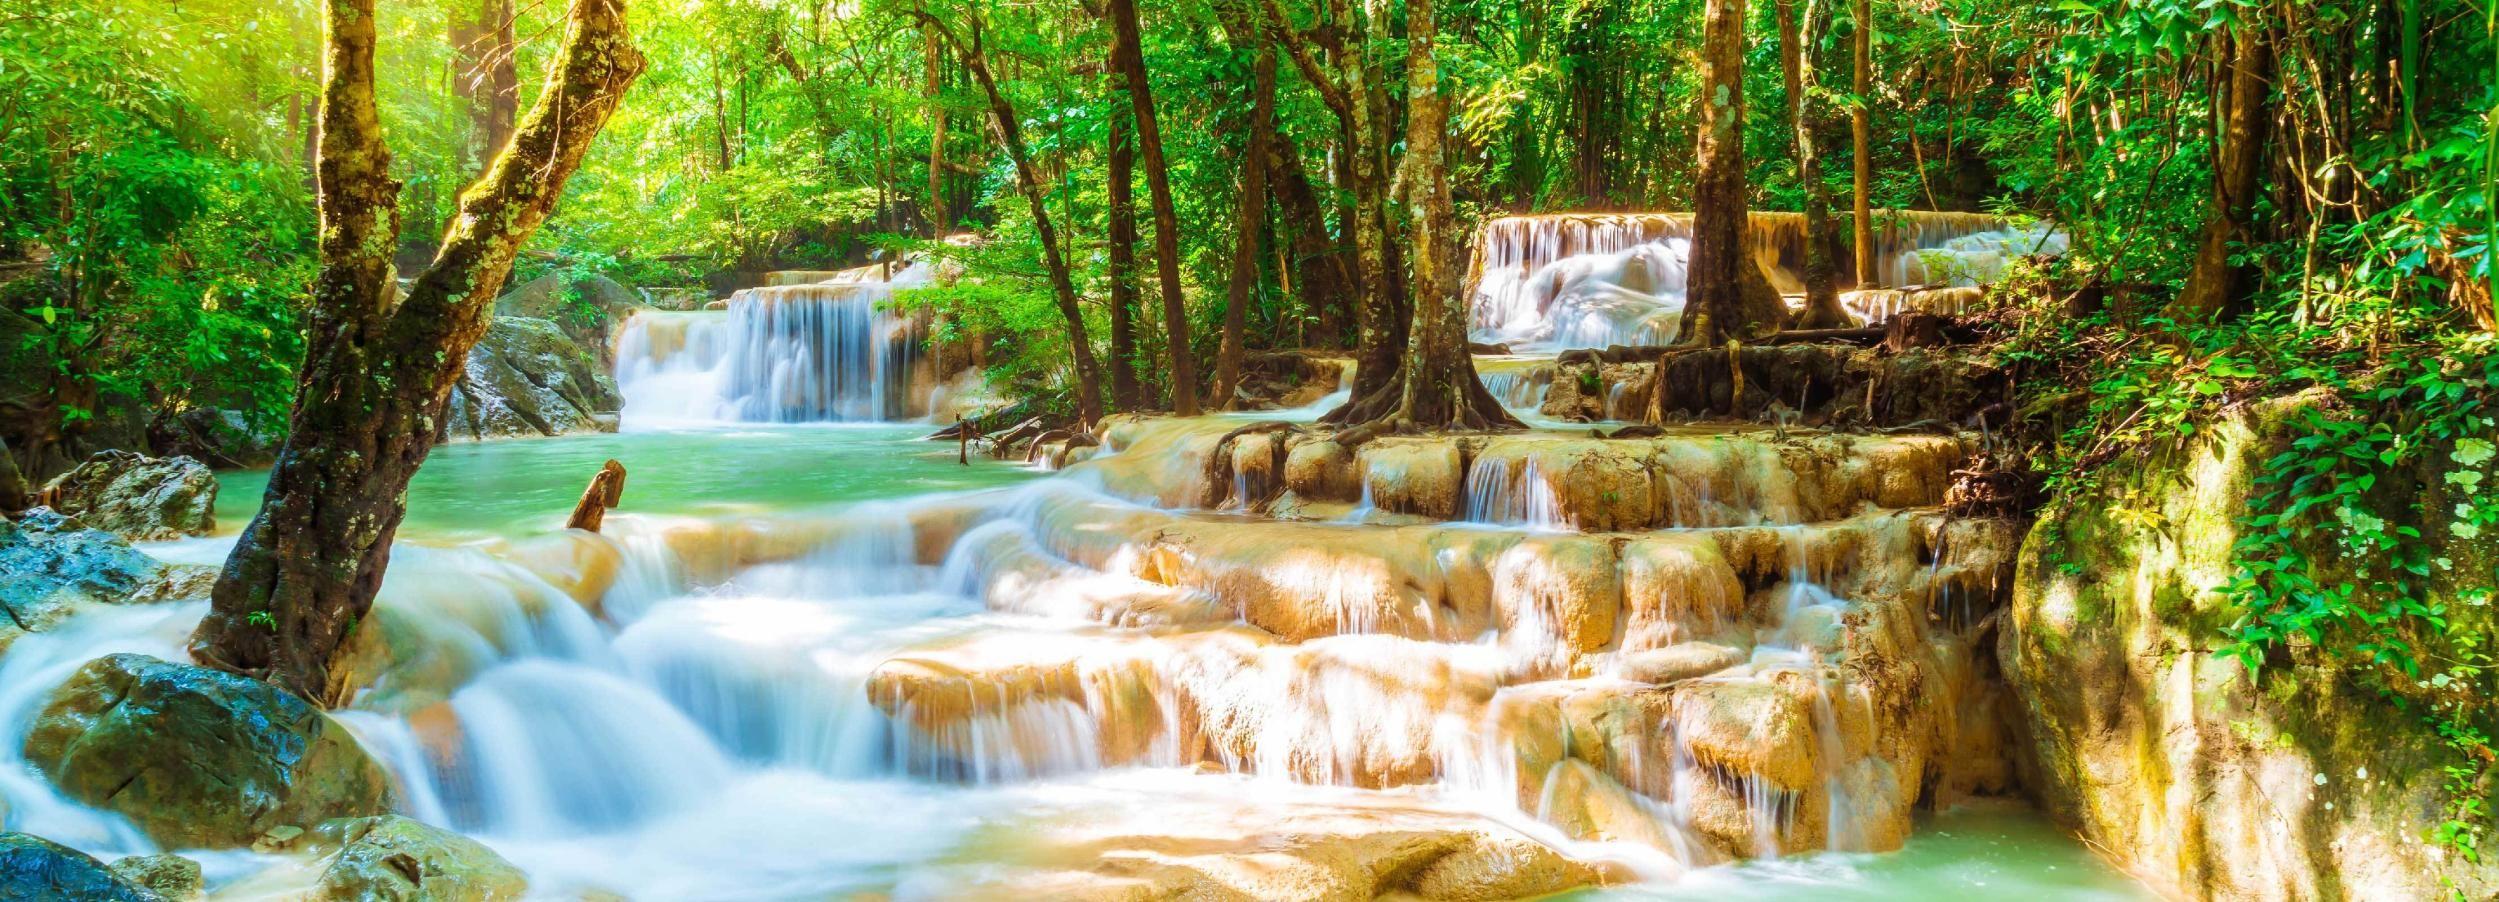 Parque Nacional de Erawan y Kanchanaburi: grupo reducido